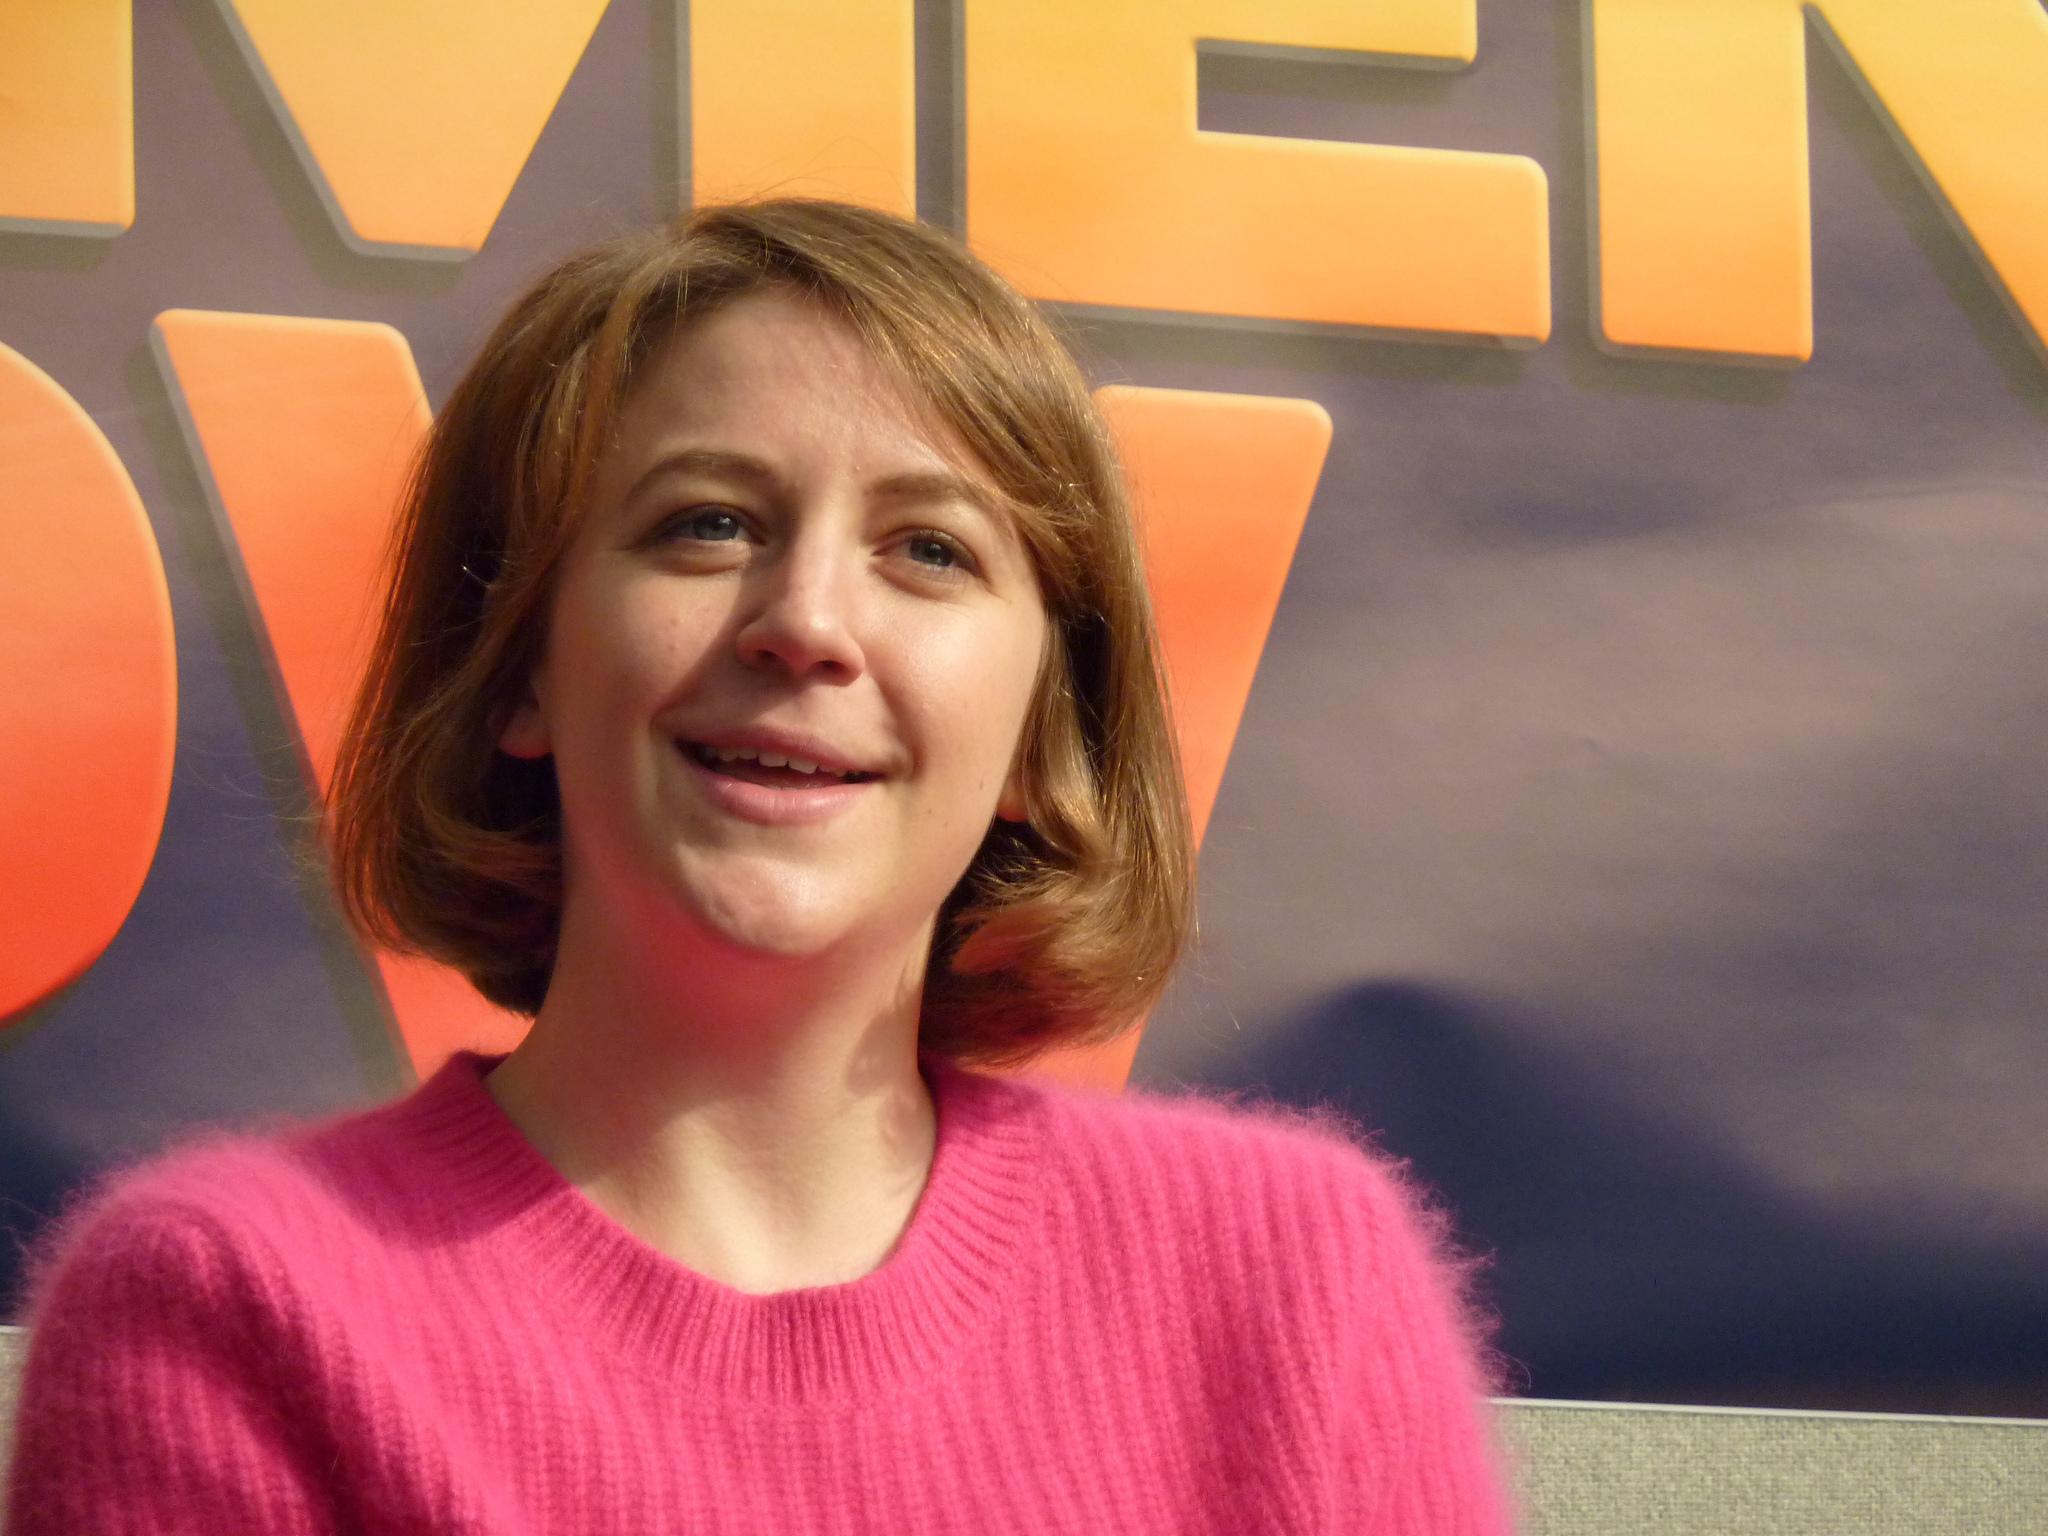 Gemma Whelan @ Collectormania convention